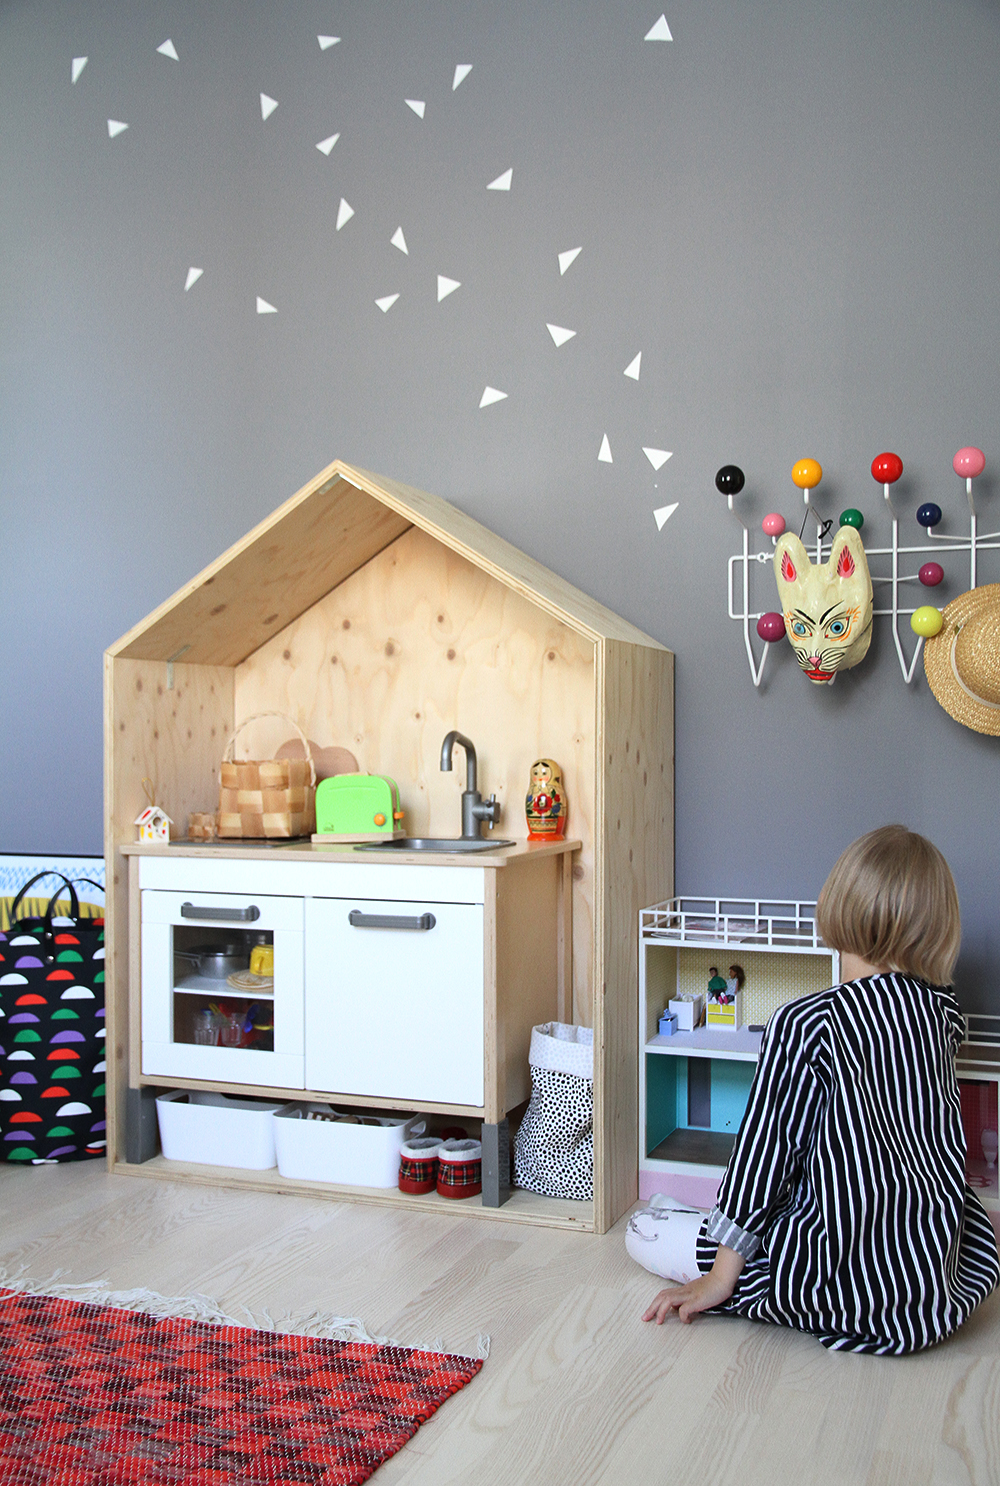 hunajaista lastenhuone kids room interior sisustus